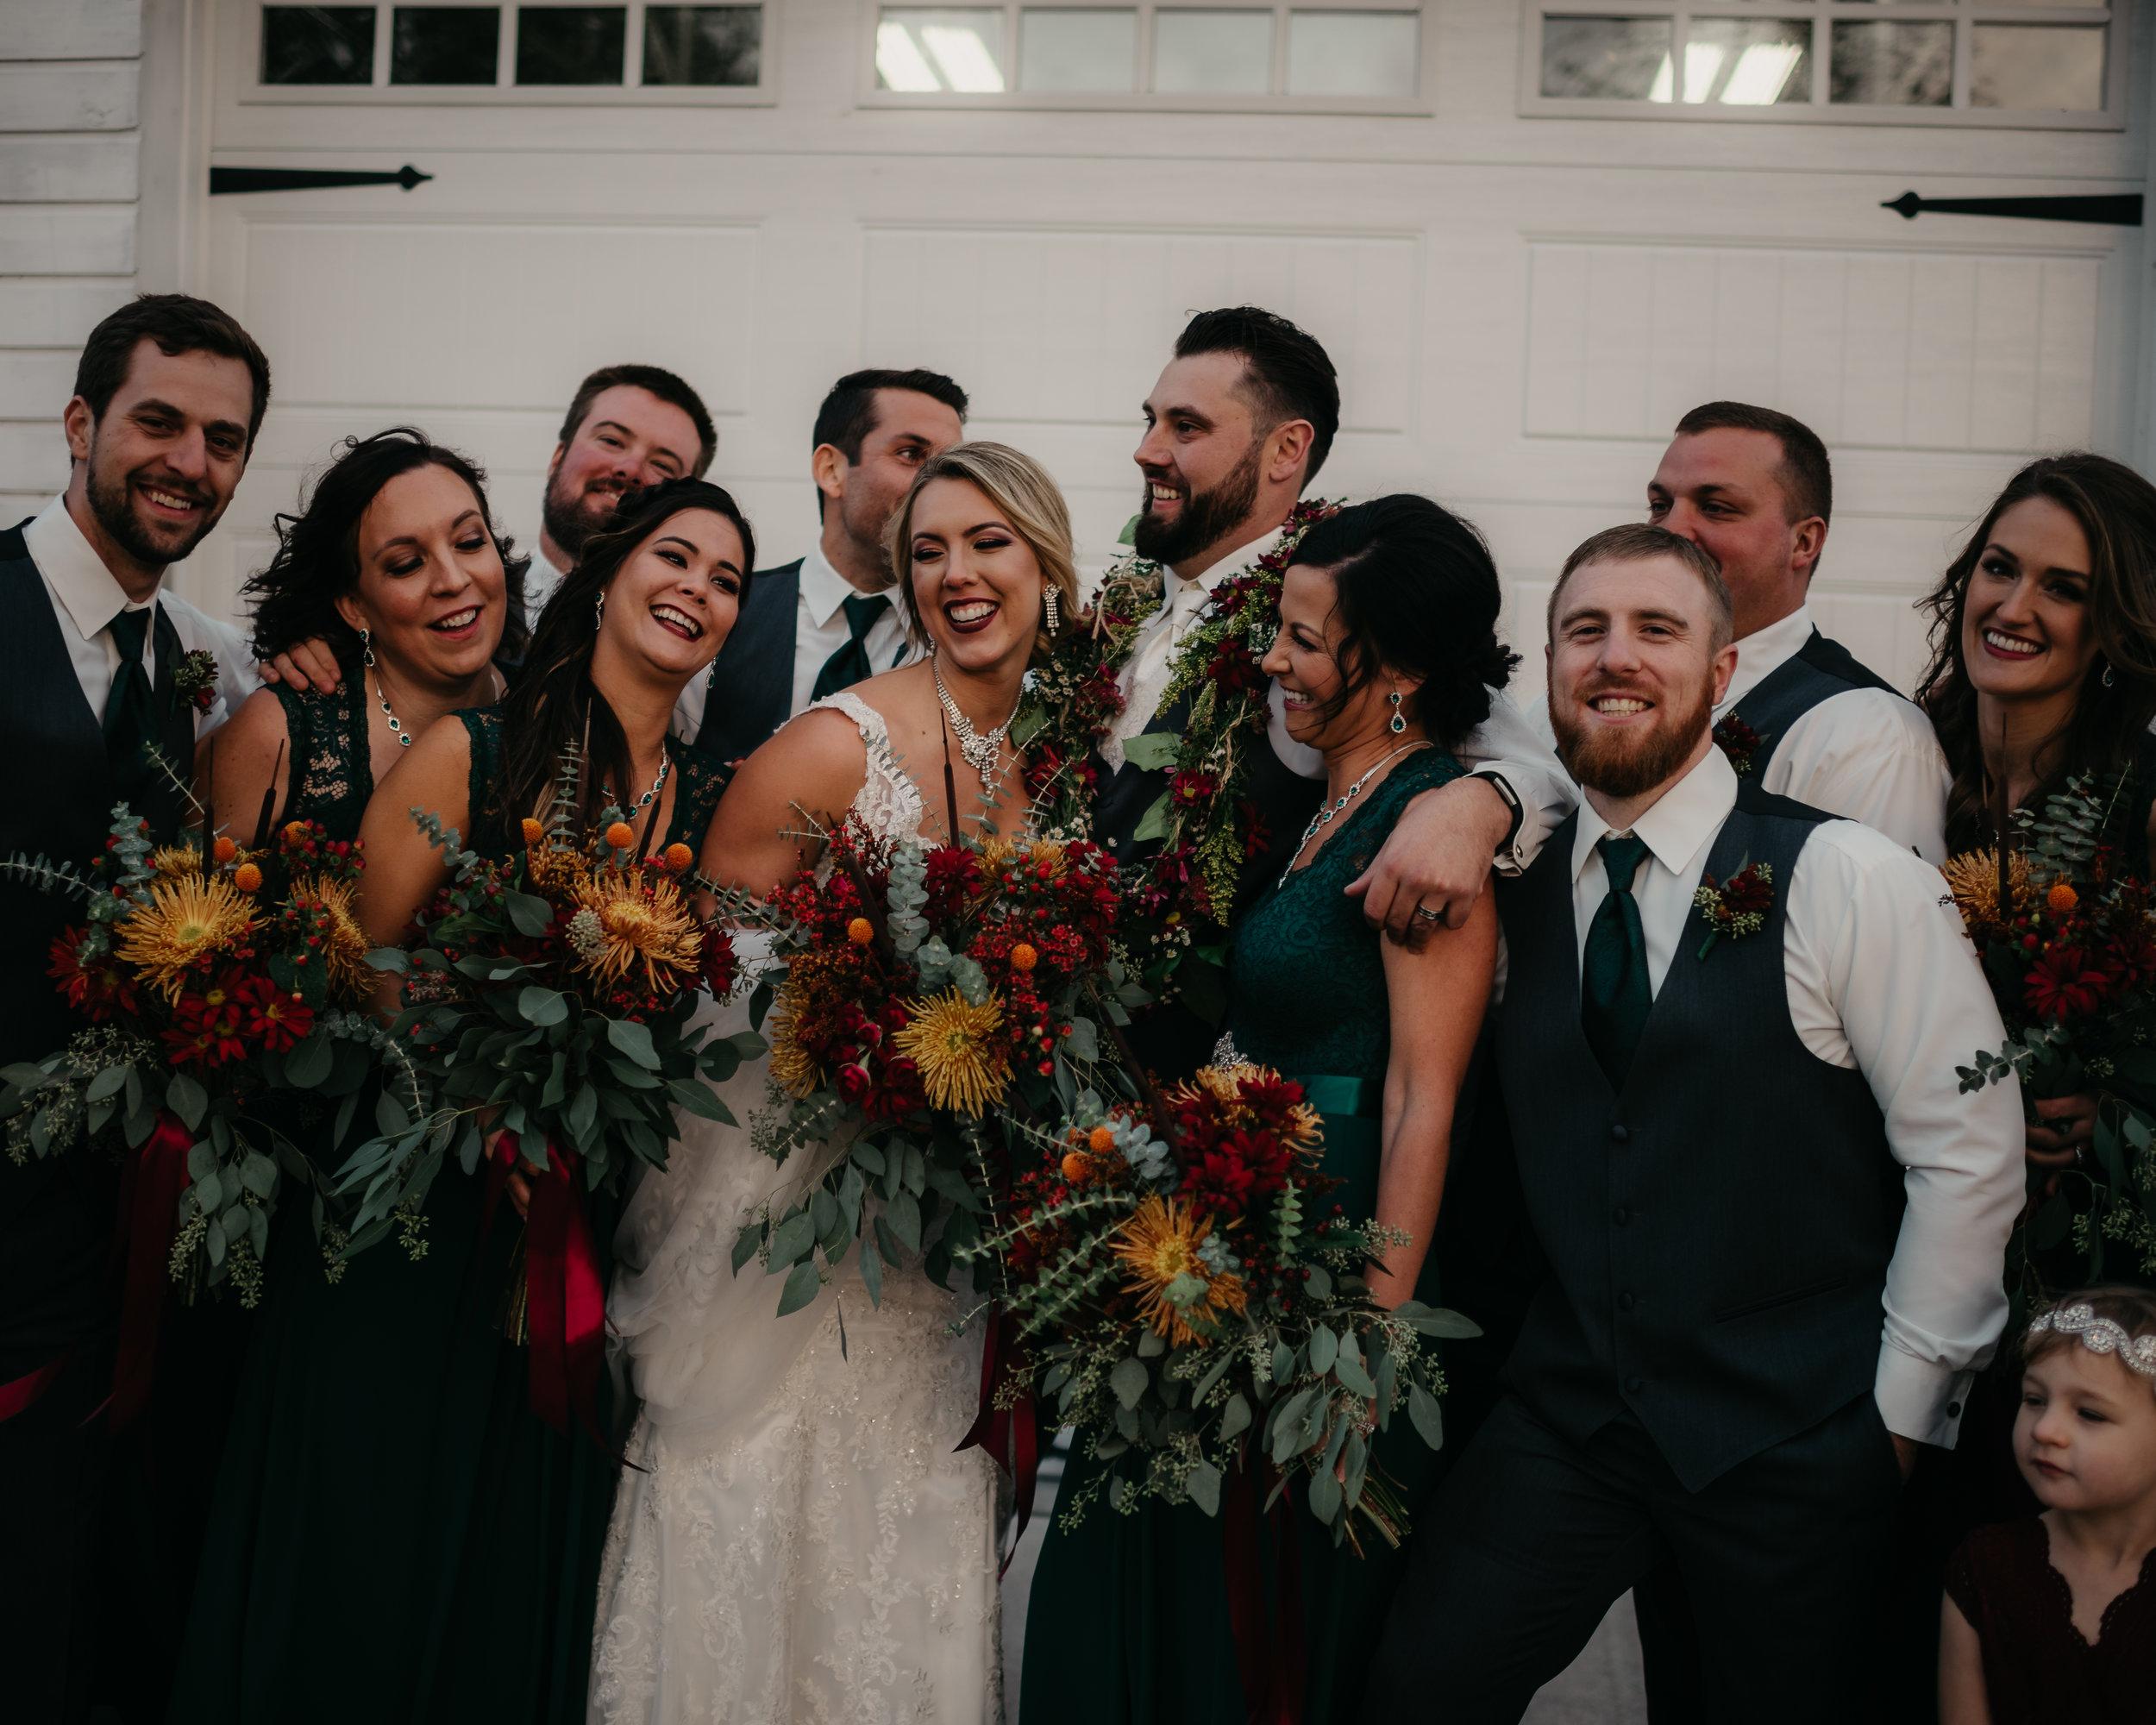 Anthony & Tamara's Wedding.1-694.jpg